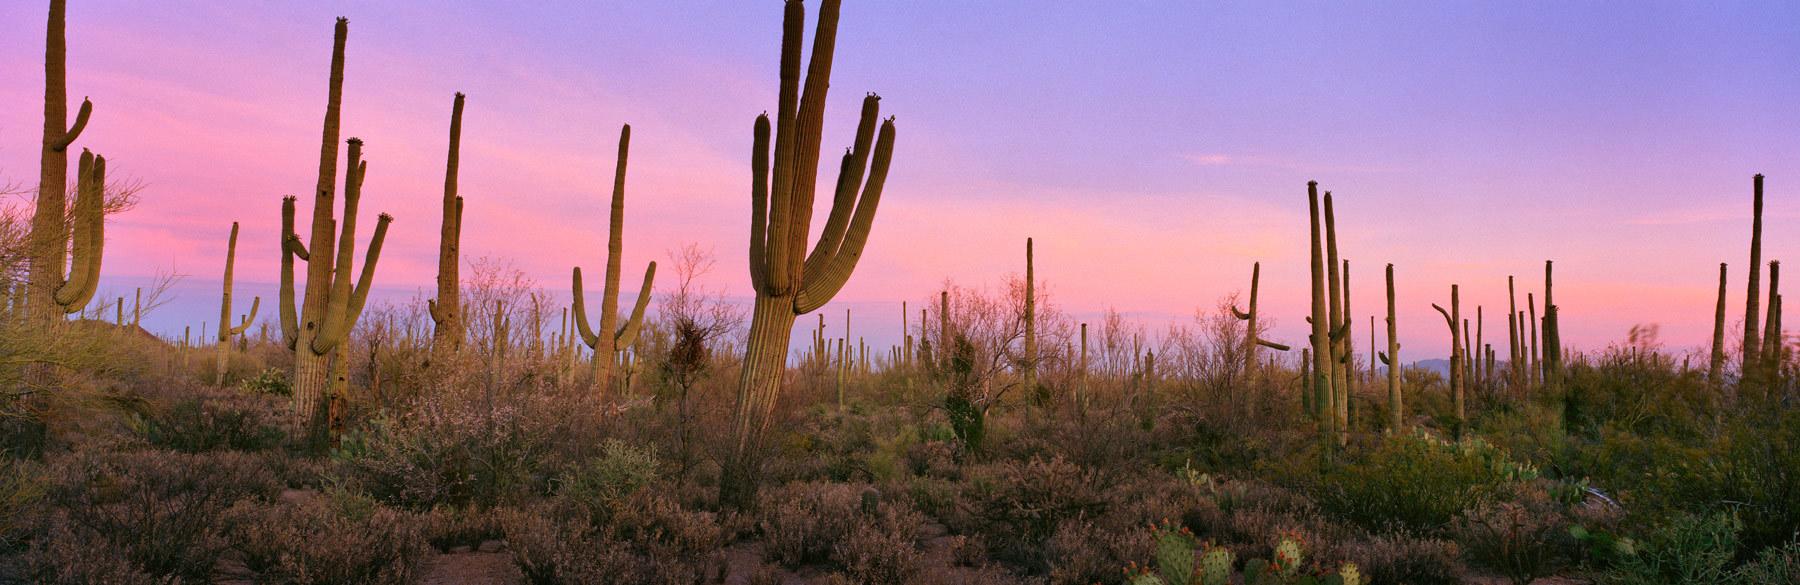 Lightbox_jorstad_saguaro_tfxkks